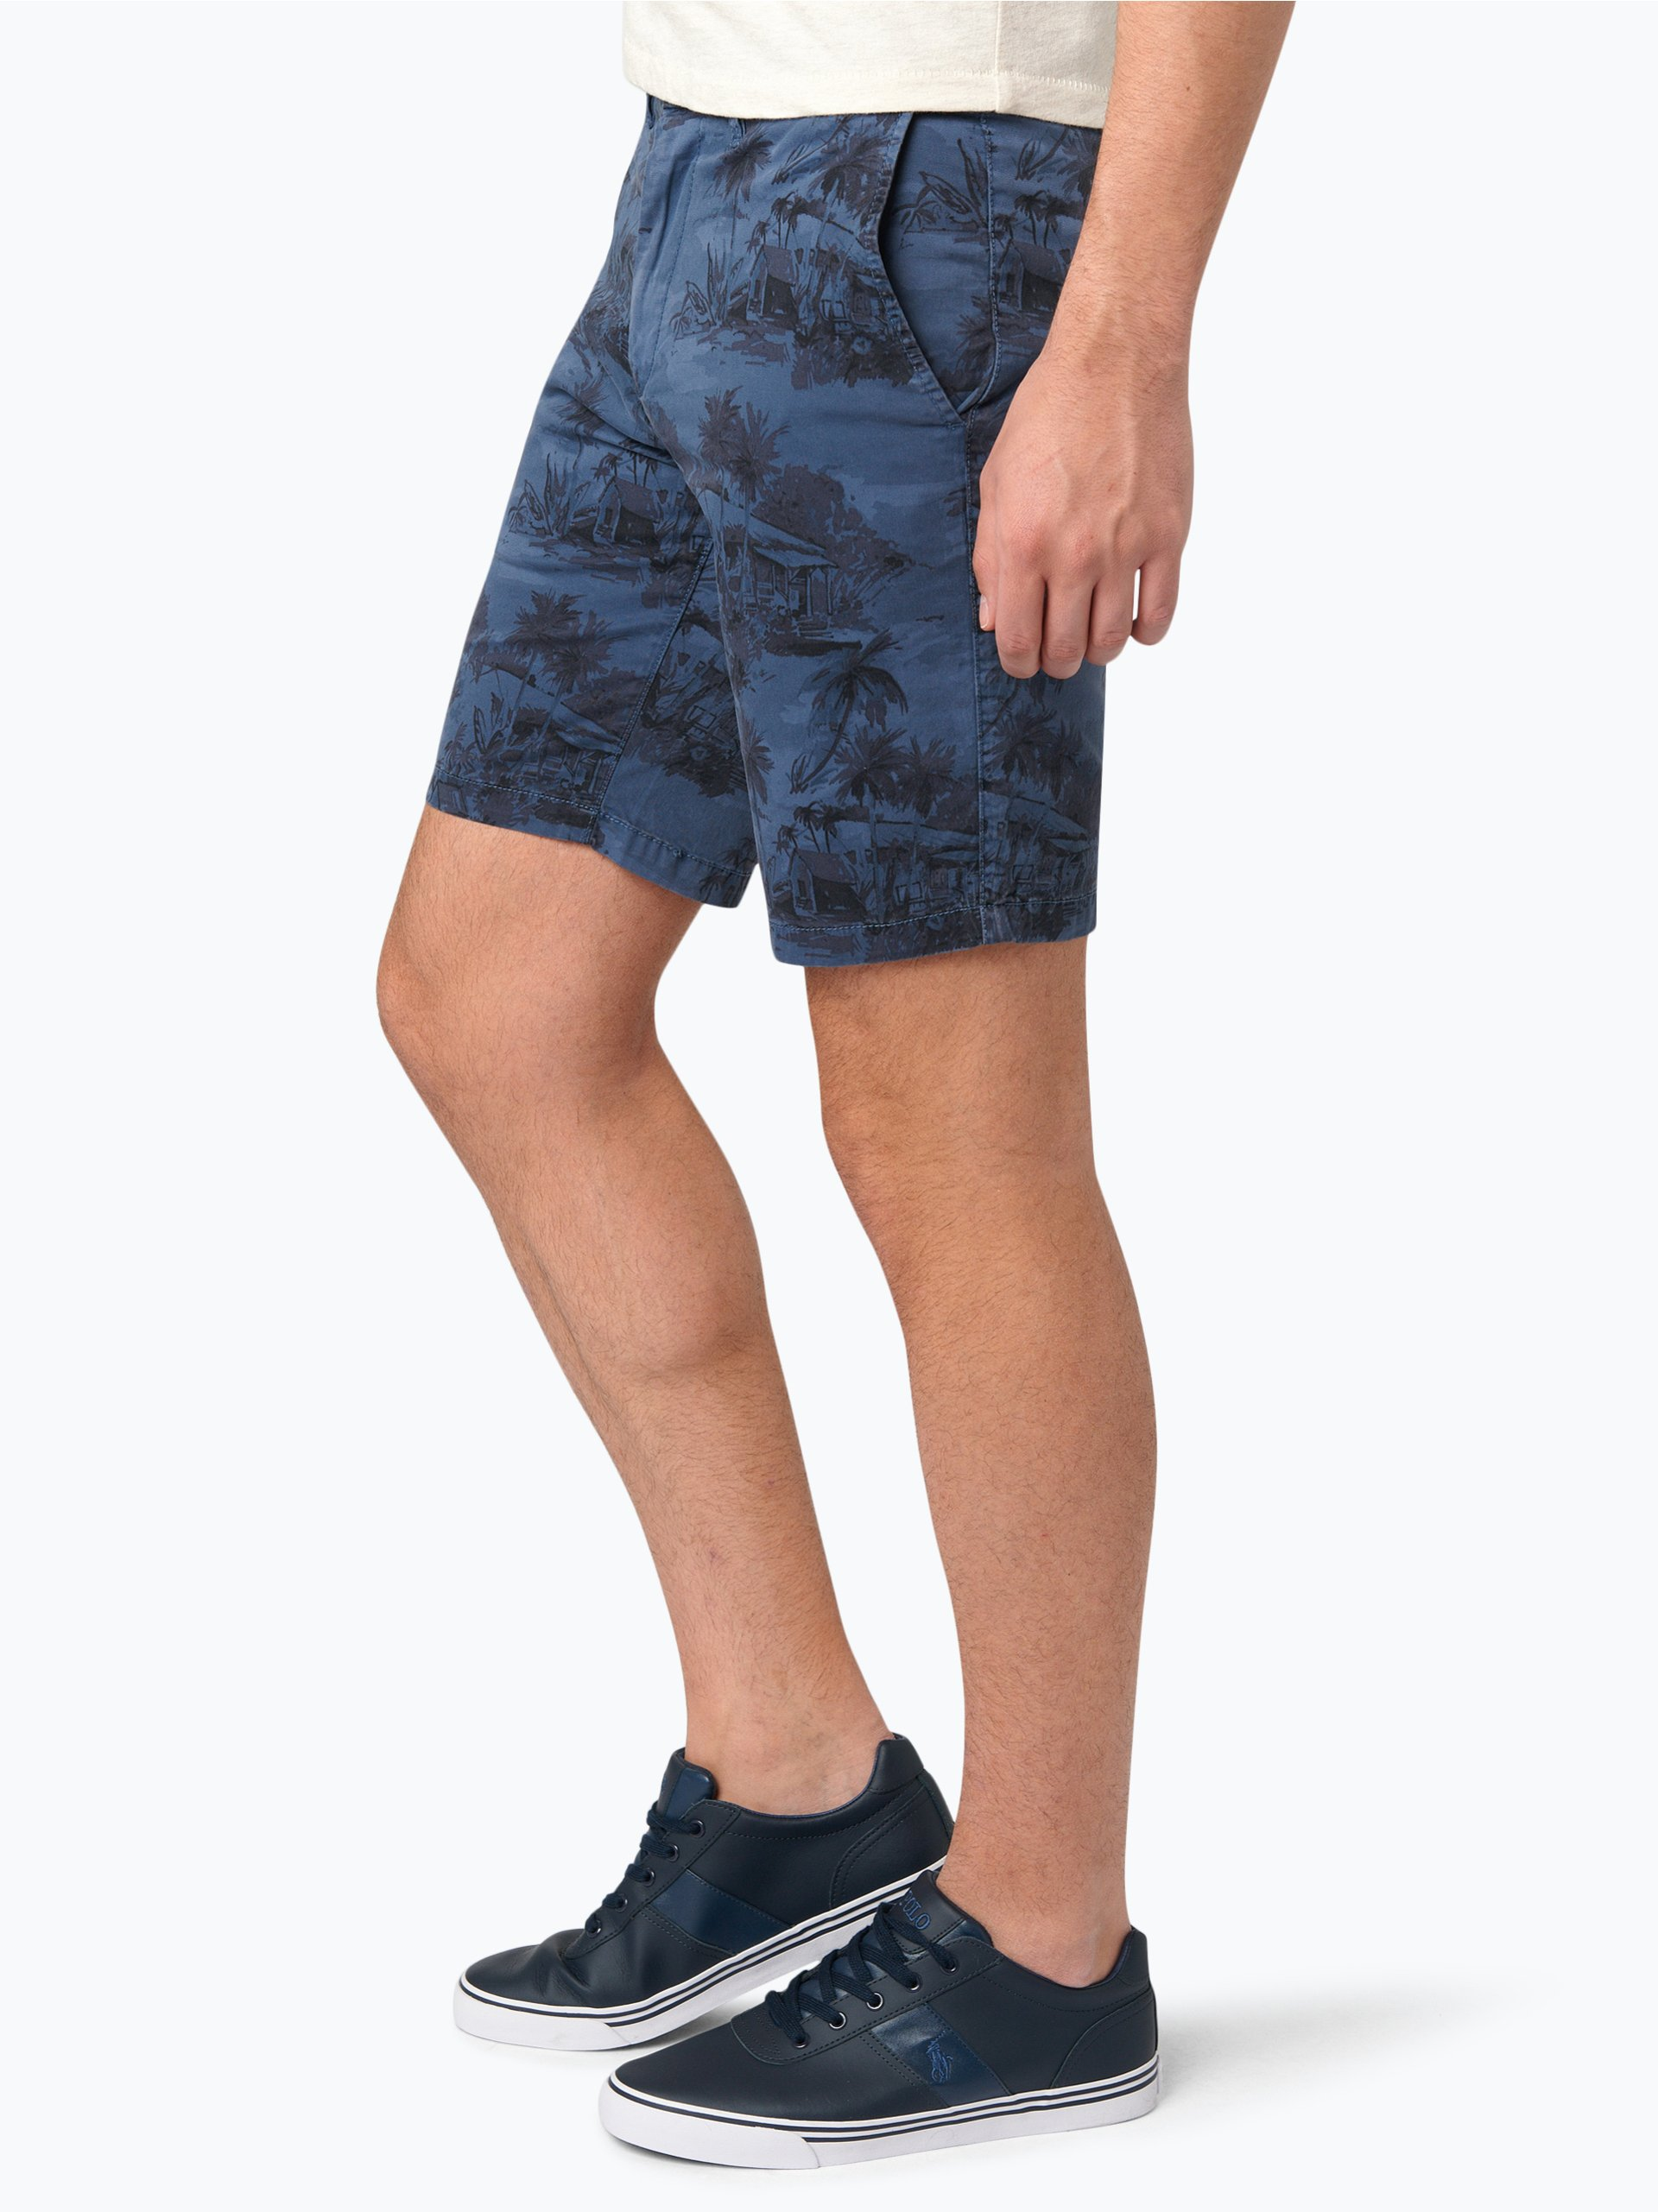 tommy hilfiger herren shorts denton blau gemustert. Black Bedroom Furniture Sets. Home Design Ideas